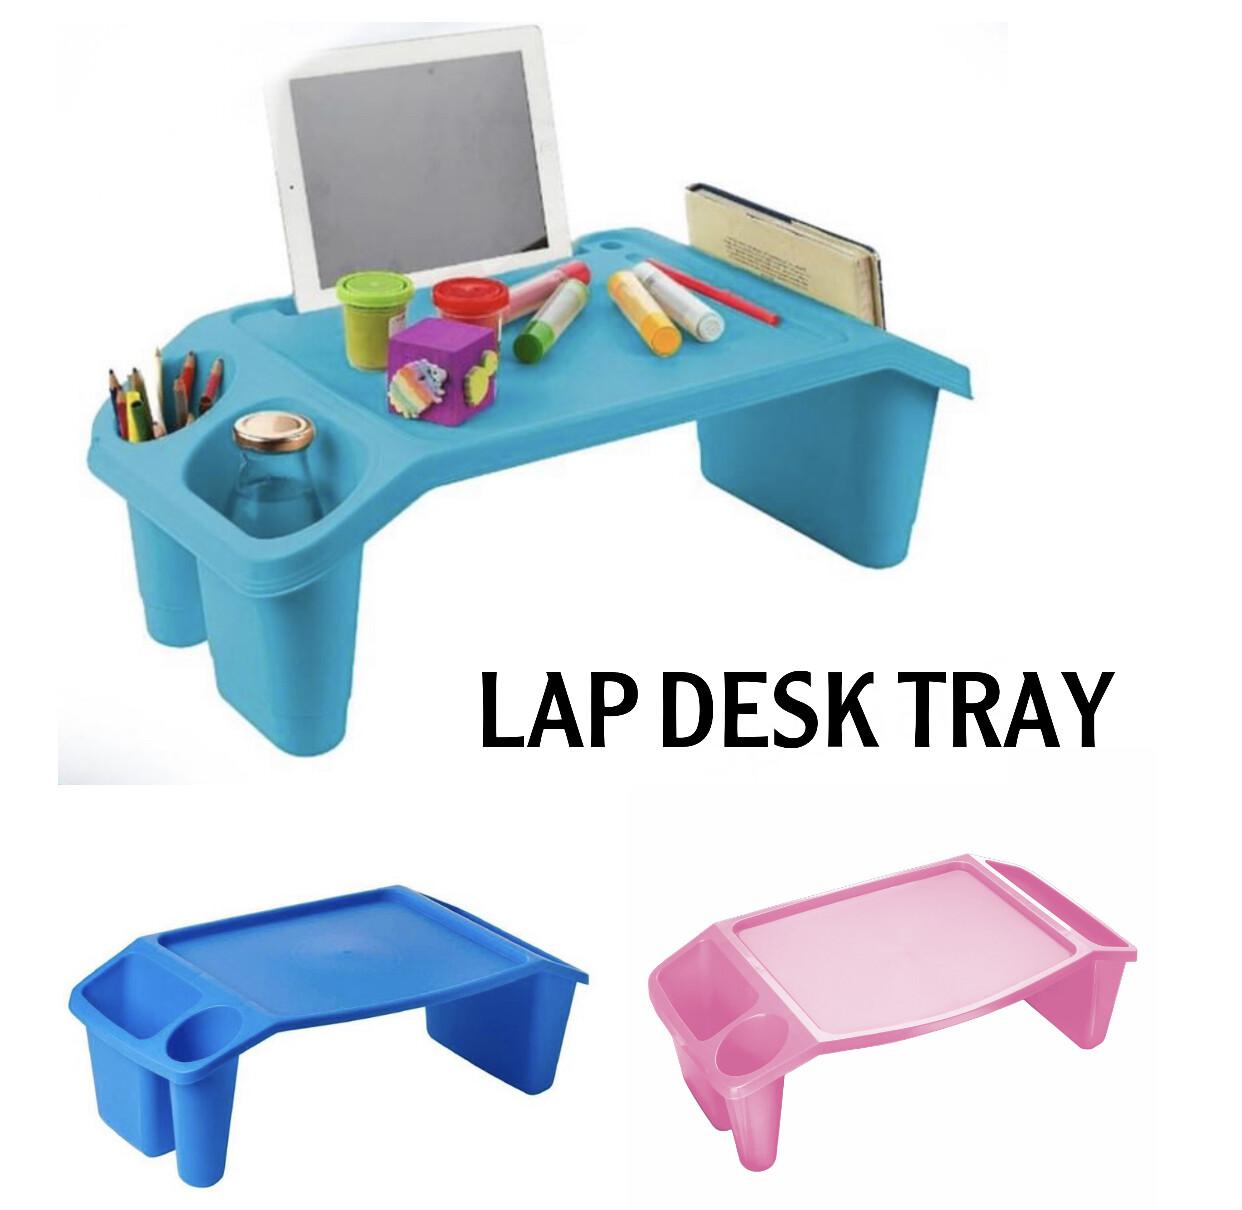 Lap Desk Tray